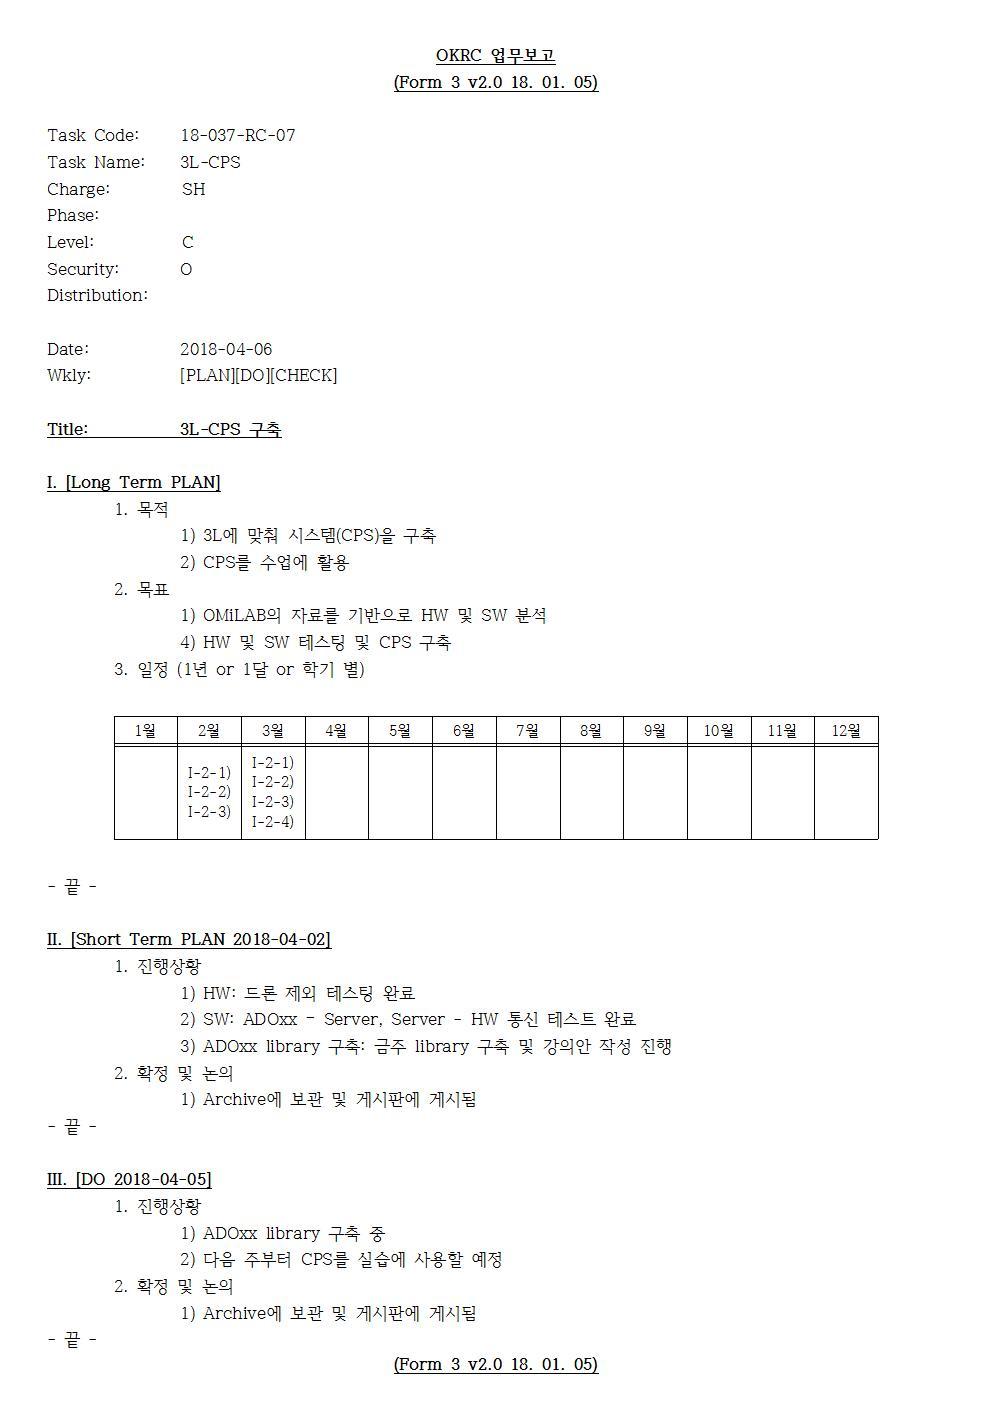 D-[18-037-RC-07]-[3L-CPS]-[2018-04-06][SH]001.jpg